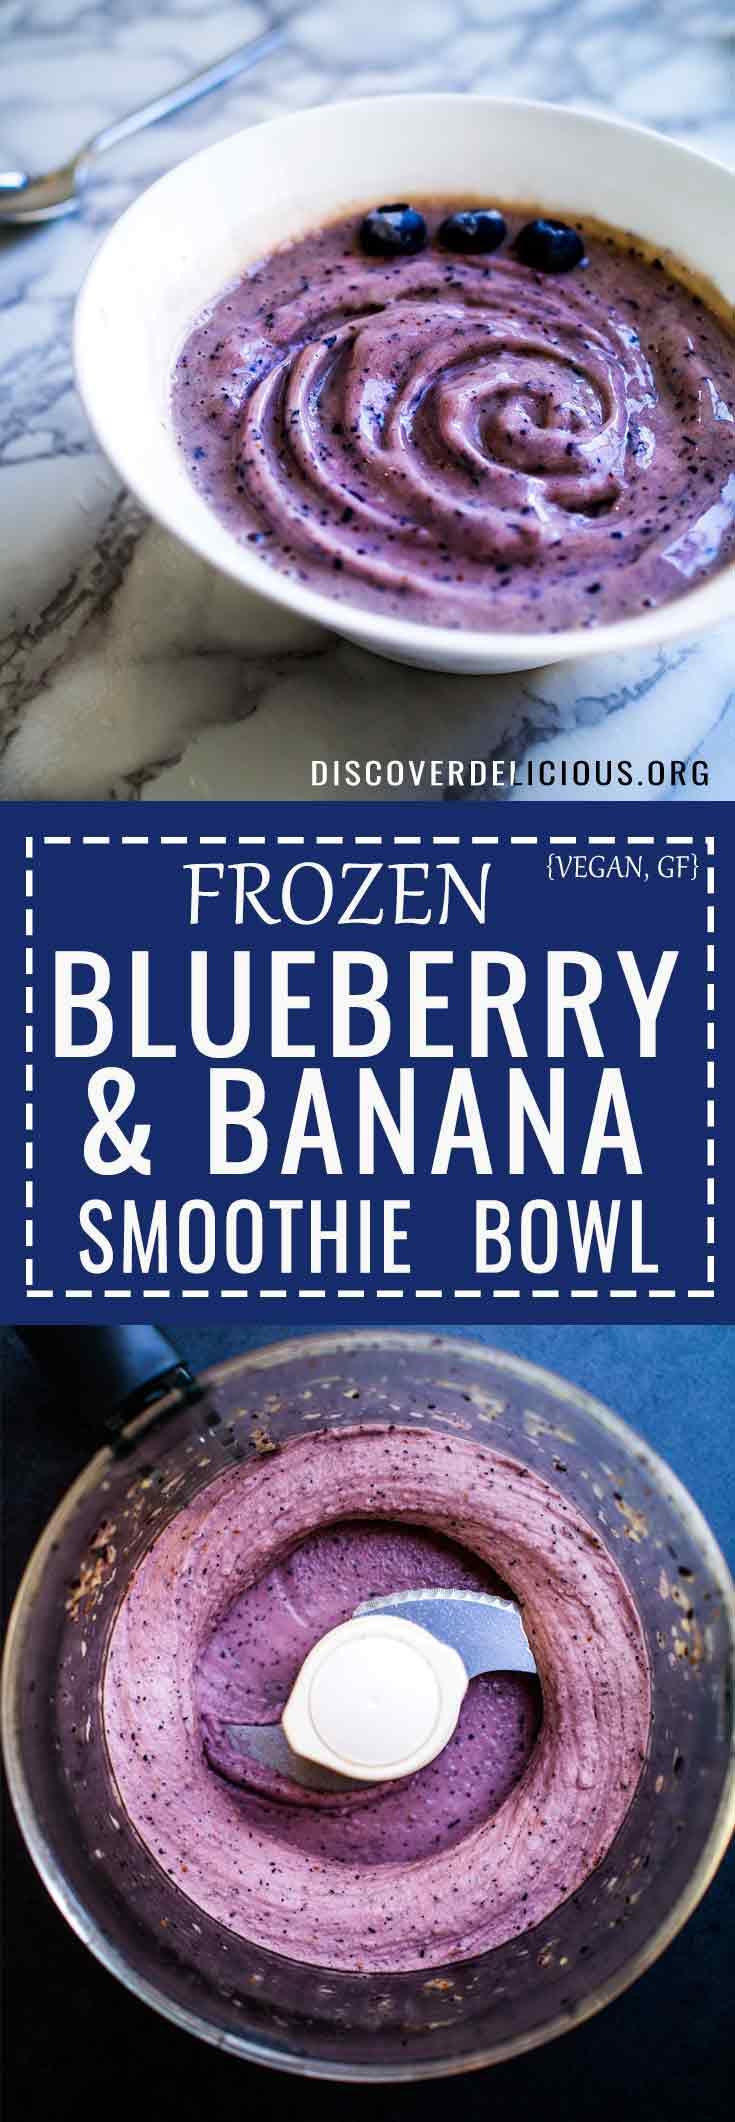 Simple 3-ingredient Blueberry & Banana Smoothie Bowl!    #recipe #vegan #vegan #berry #breakfast #easy #healthy #glutenfree #gluten #dairy #free